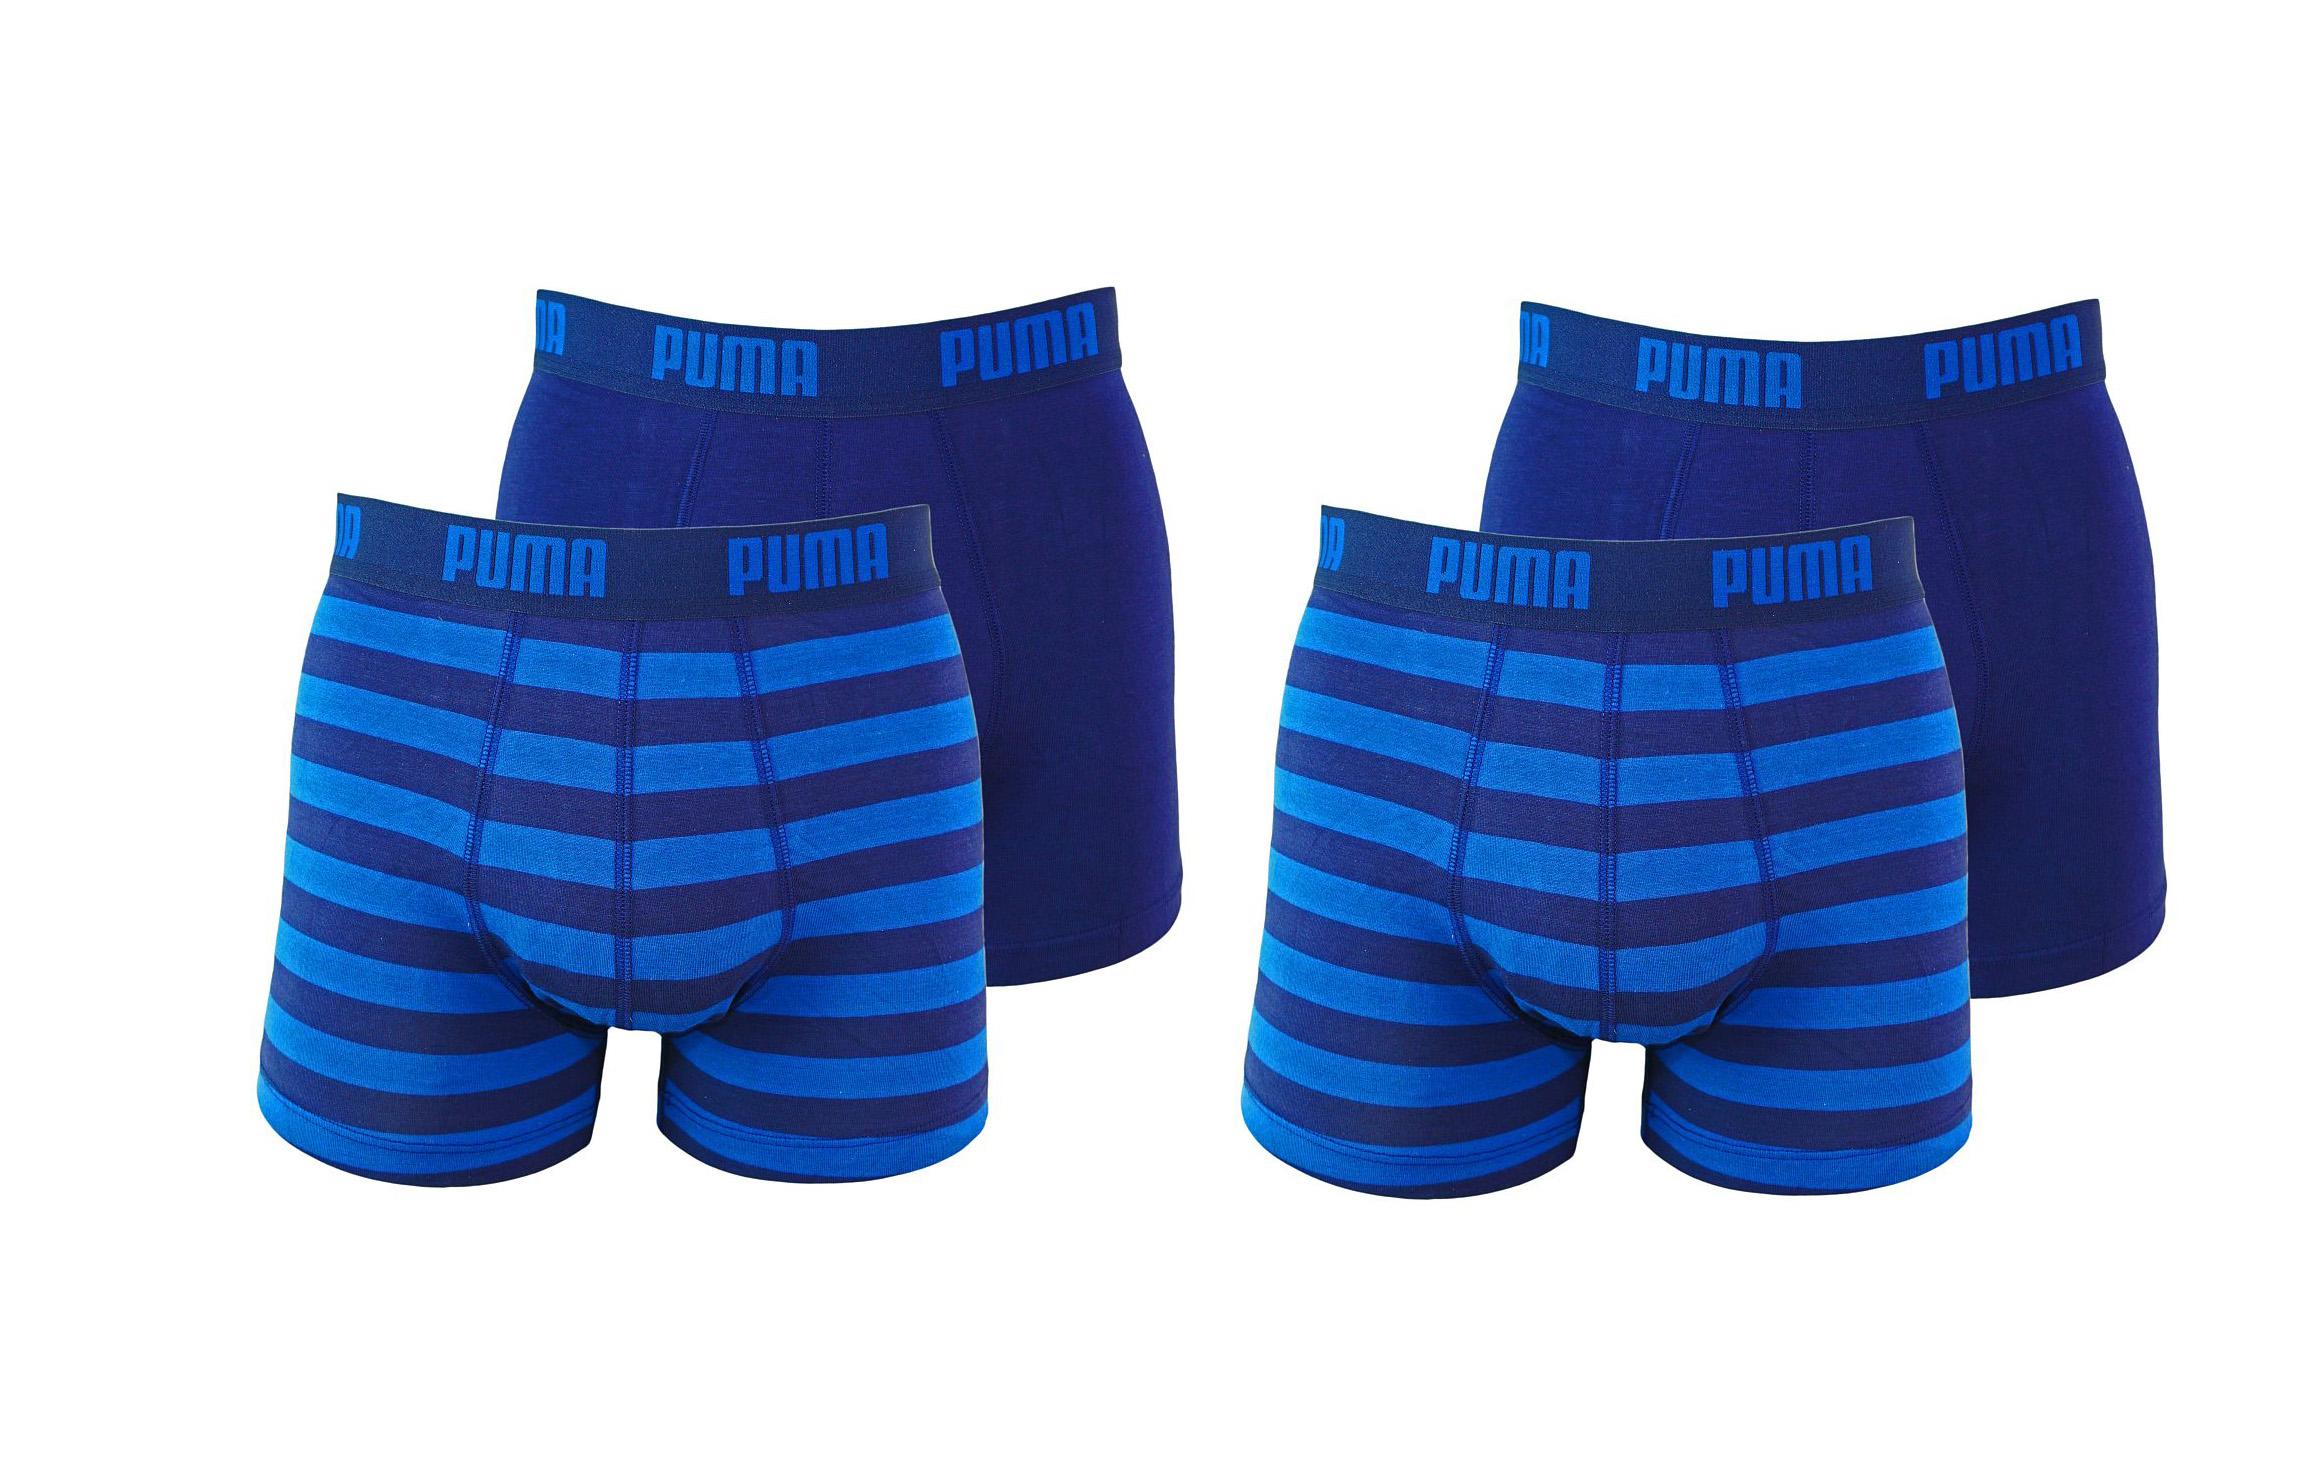 PUMA Shorts Unterhosen 2 x 2er Pack Boxer 651001001 056 020 blue SF17-PMS2